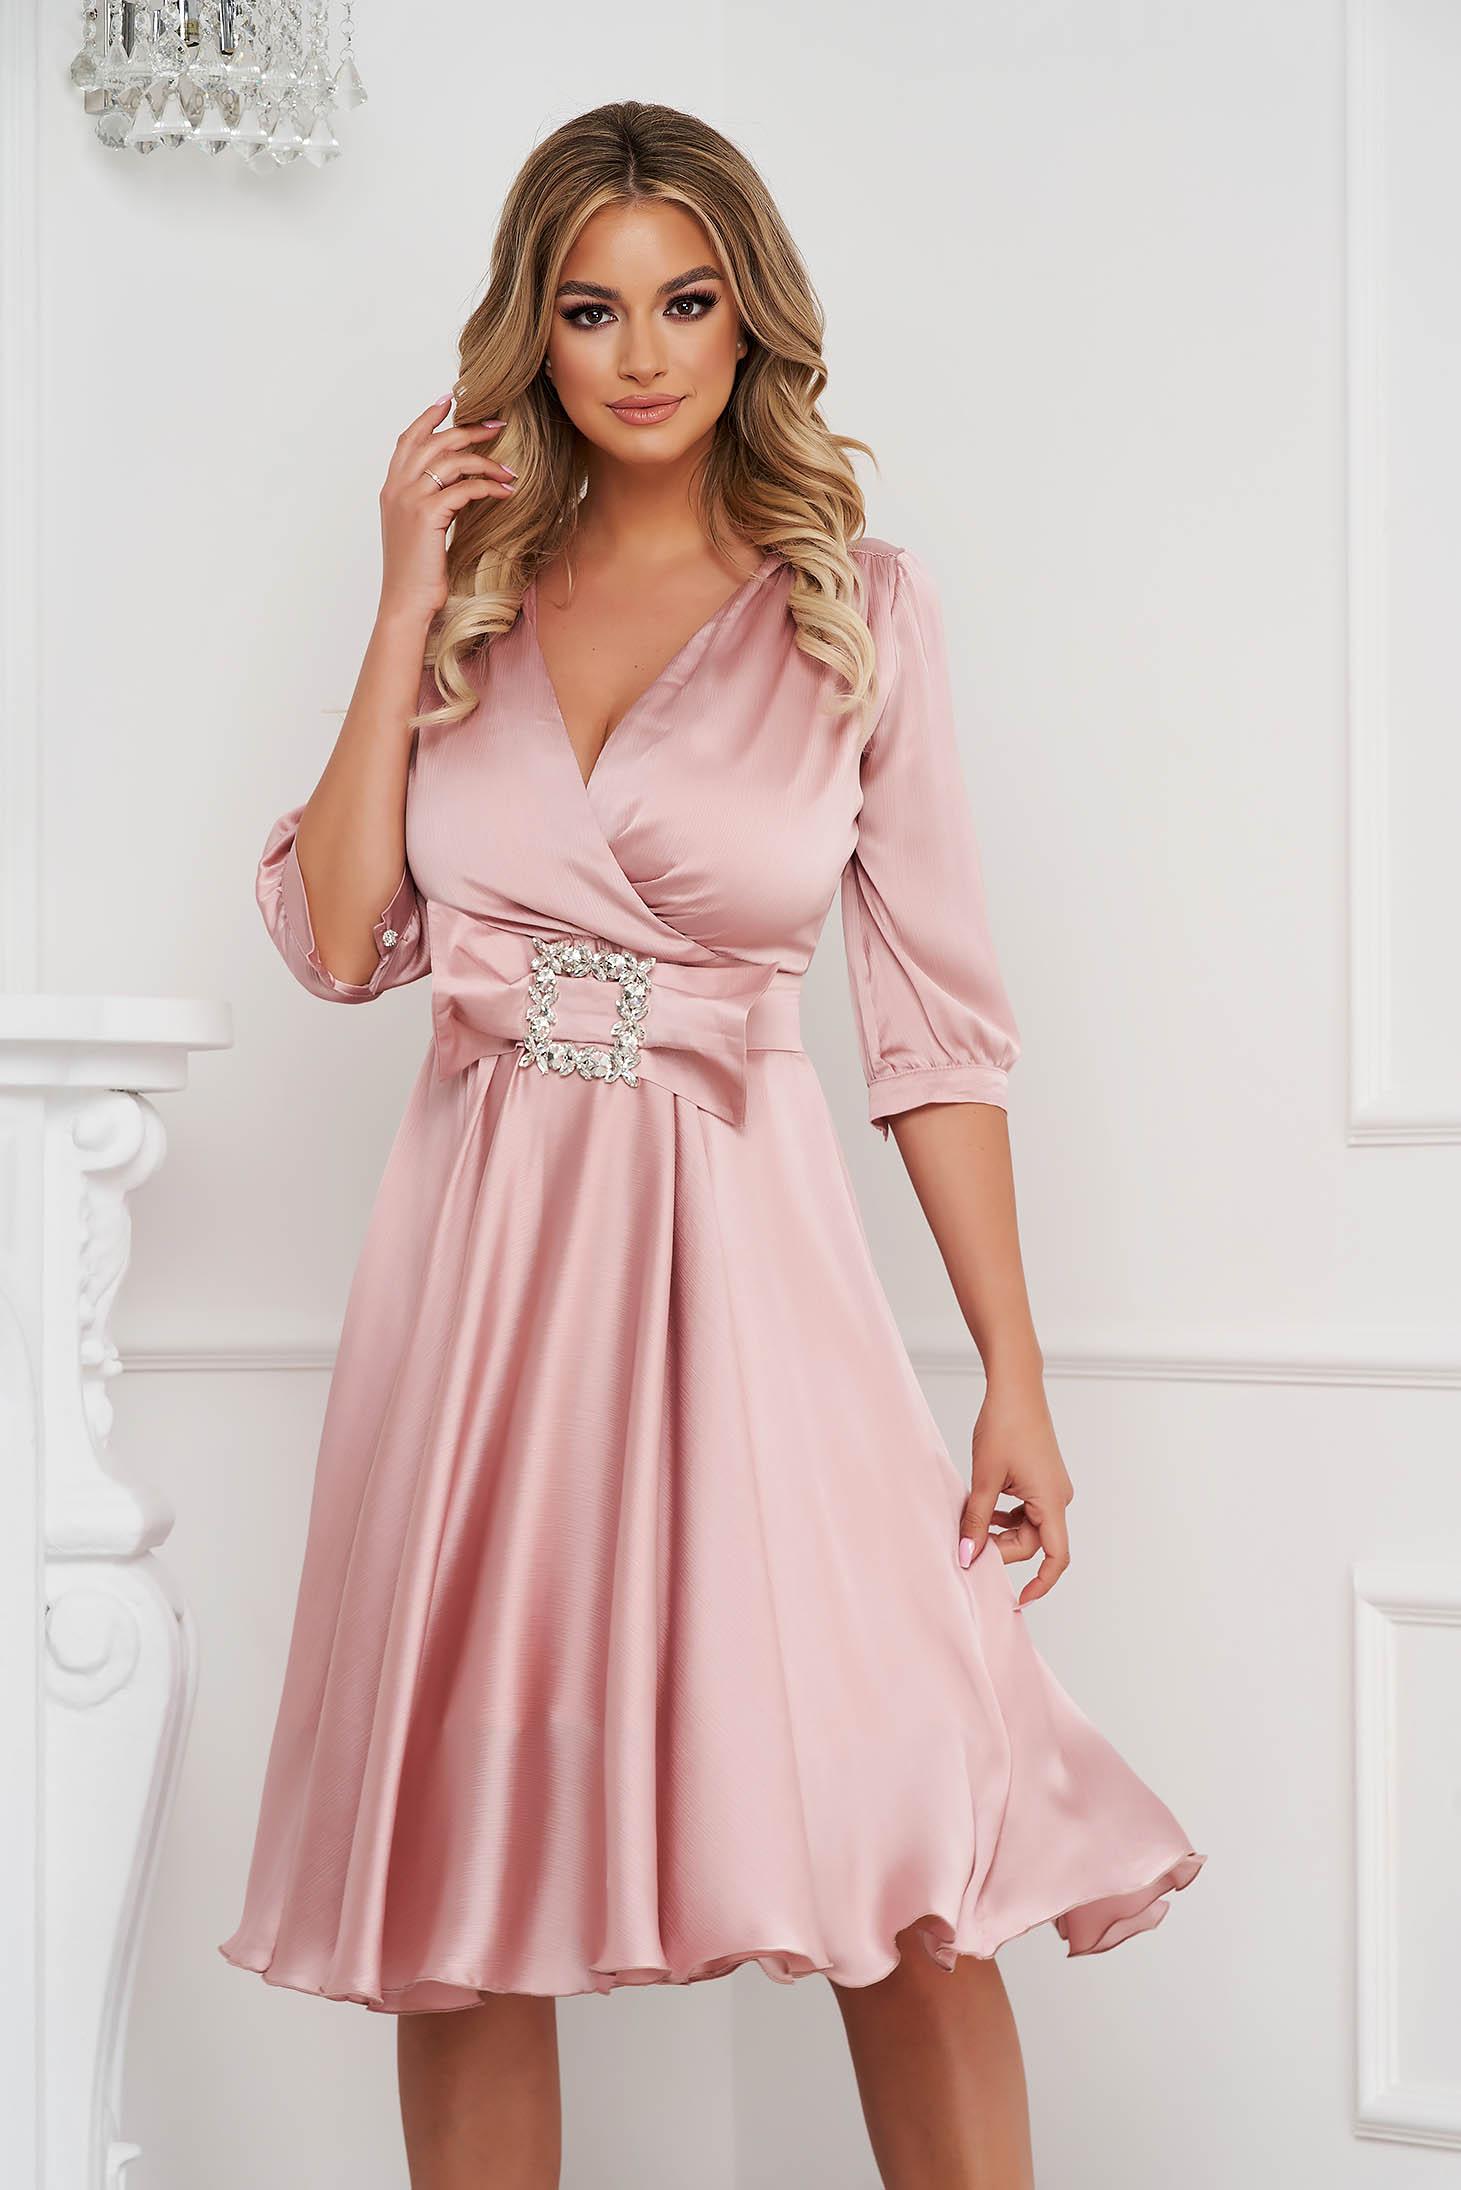 Lightpink dress elegant midi cloche from satin buckle accessory